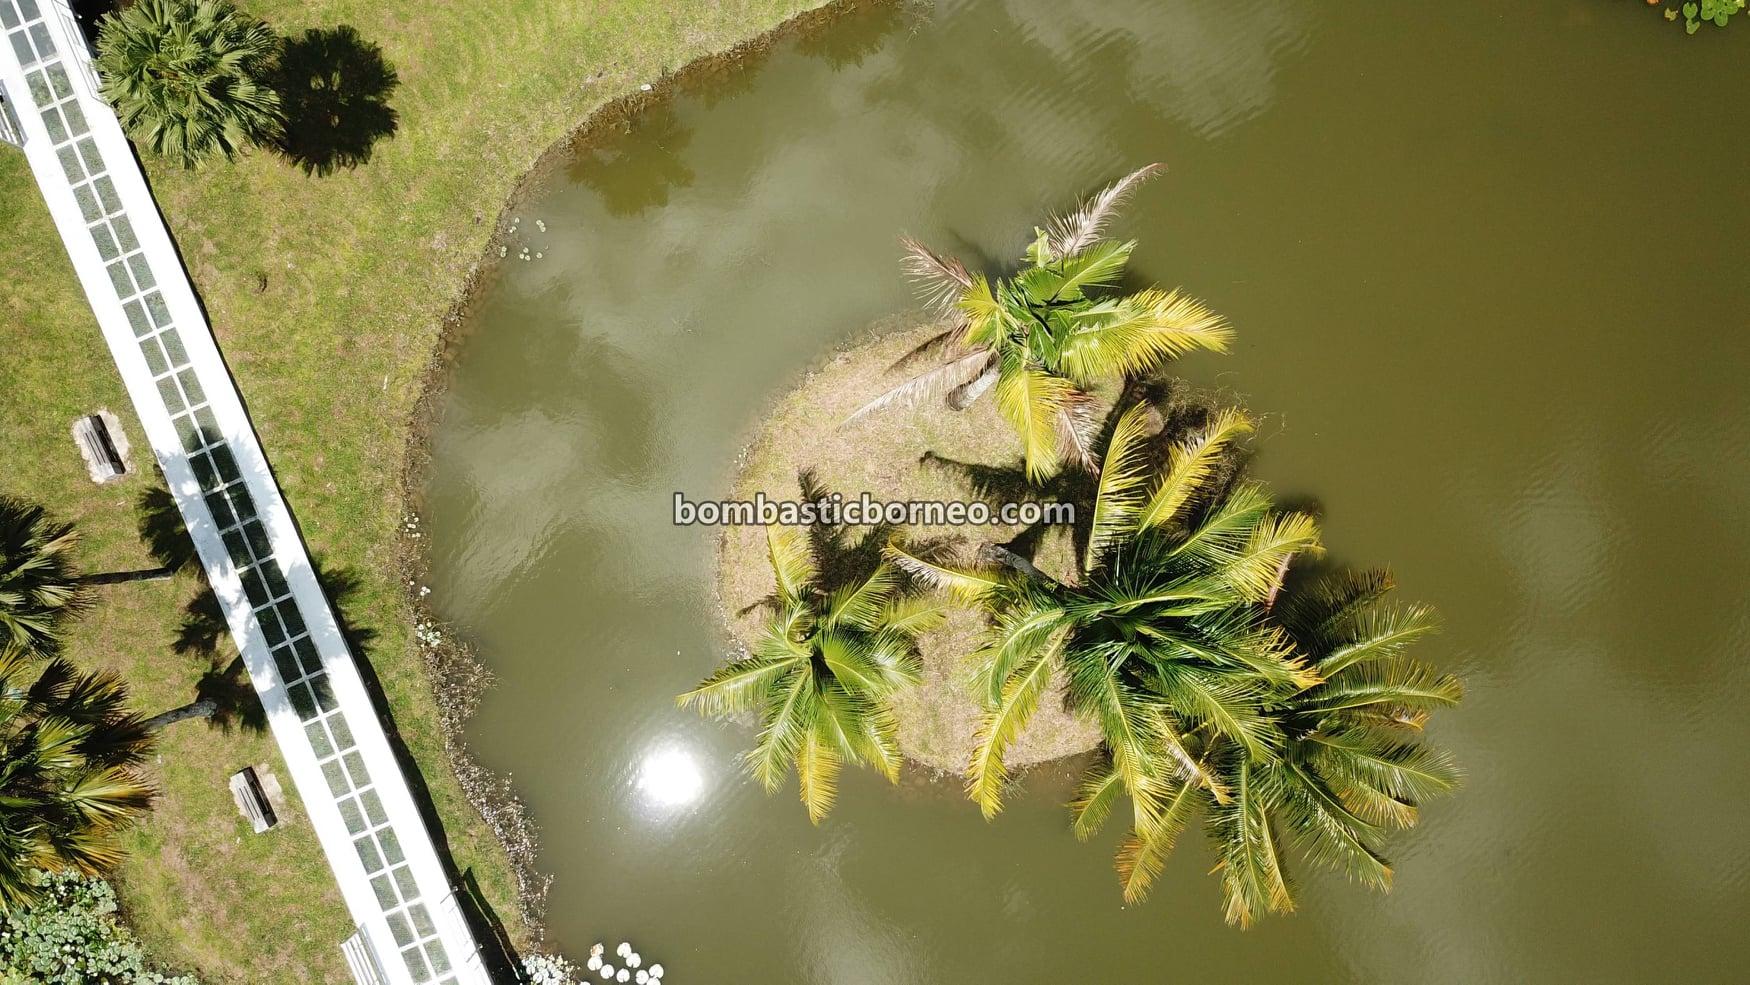 Sarawak Botanical Garden, recreational park, tempat senaman, outdoor, exercise, destination, Malaysia, Borneo, cycling, manmade lake, objek wisata, Tourism, travel guide, 马来西亚砂拉越, 古晋植物园景点